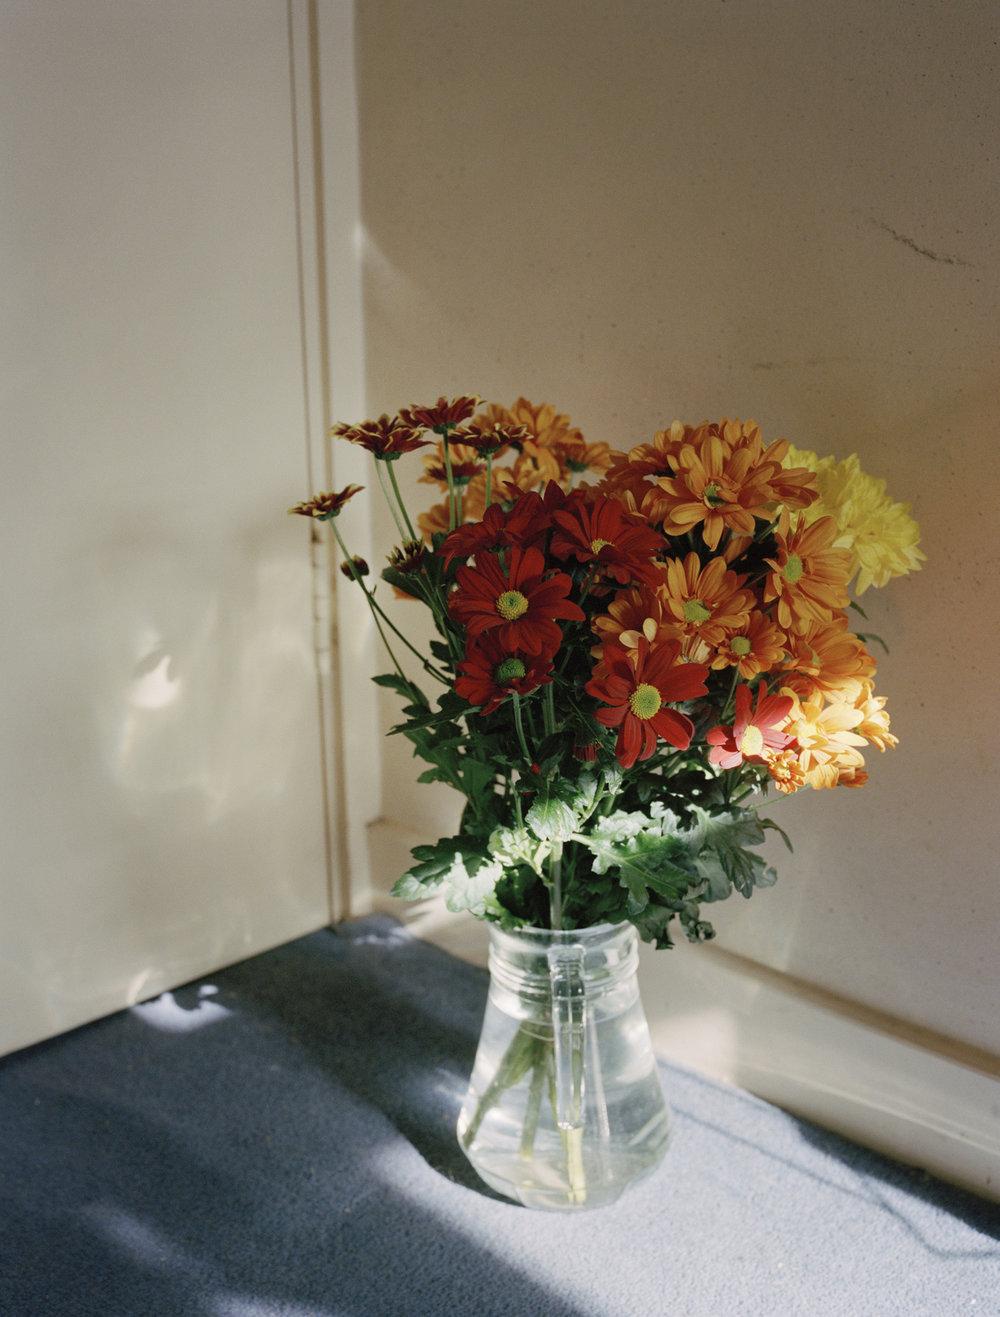 daisies_small.jpg